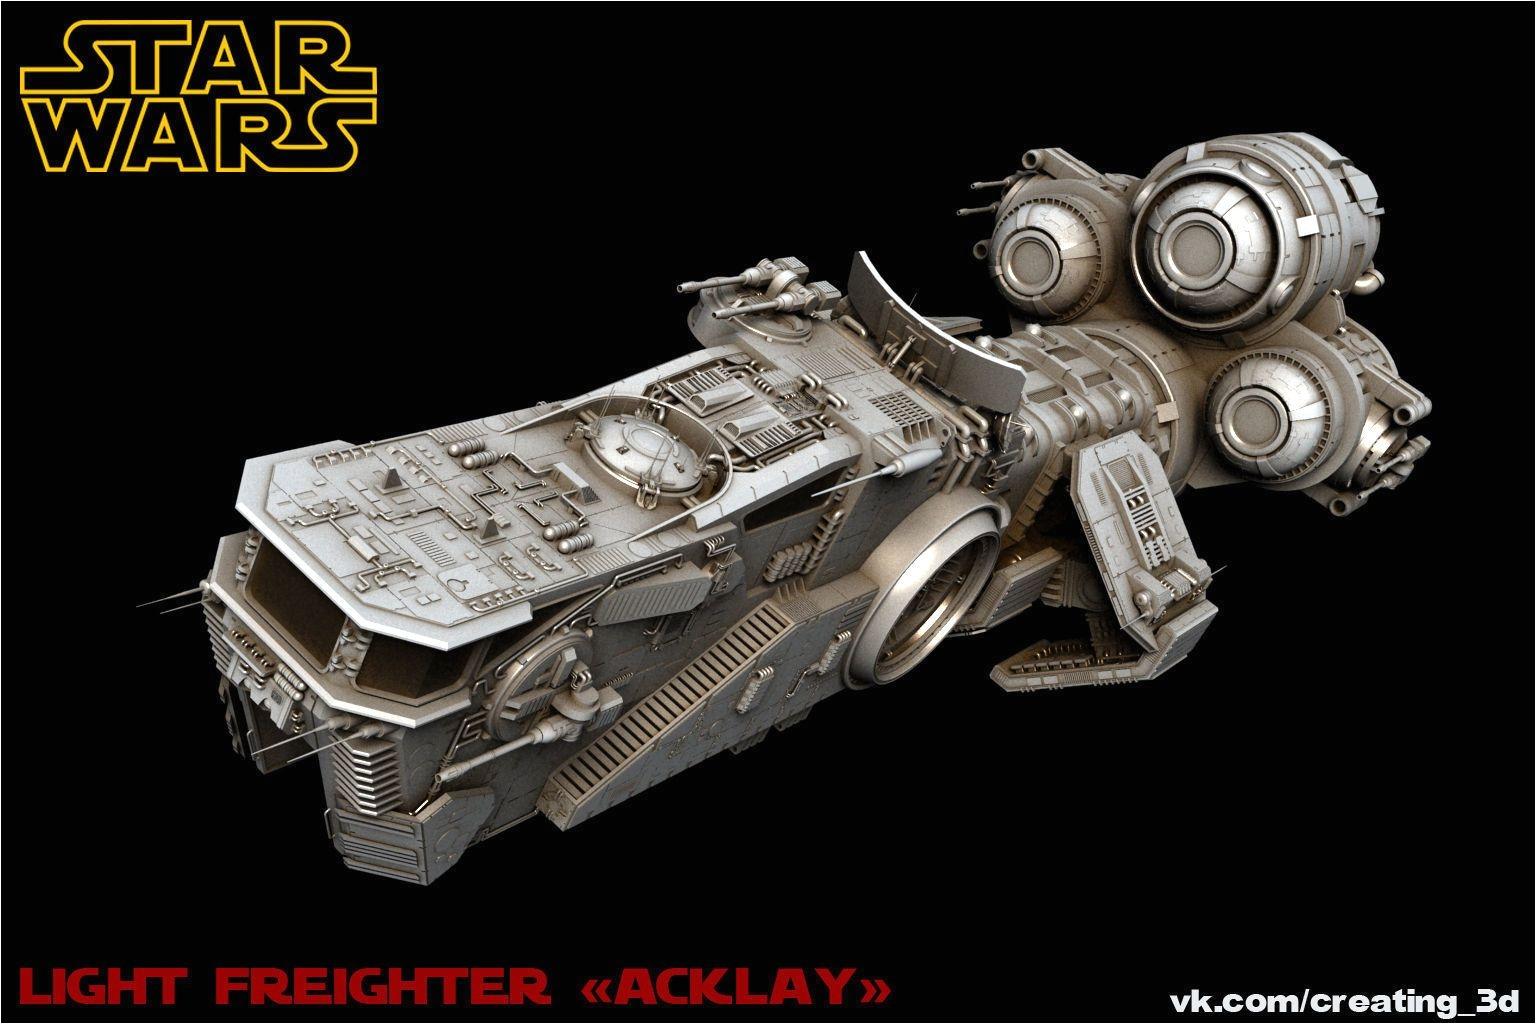 star wars light freighter acklay 3d model star wars light star and star wars ships